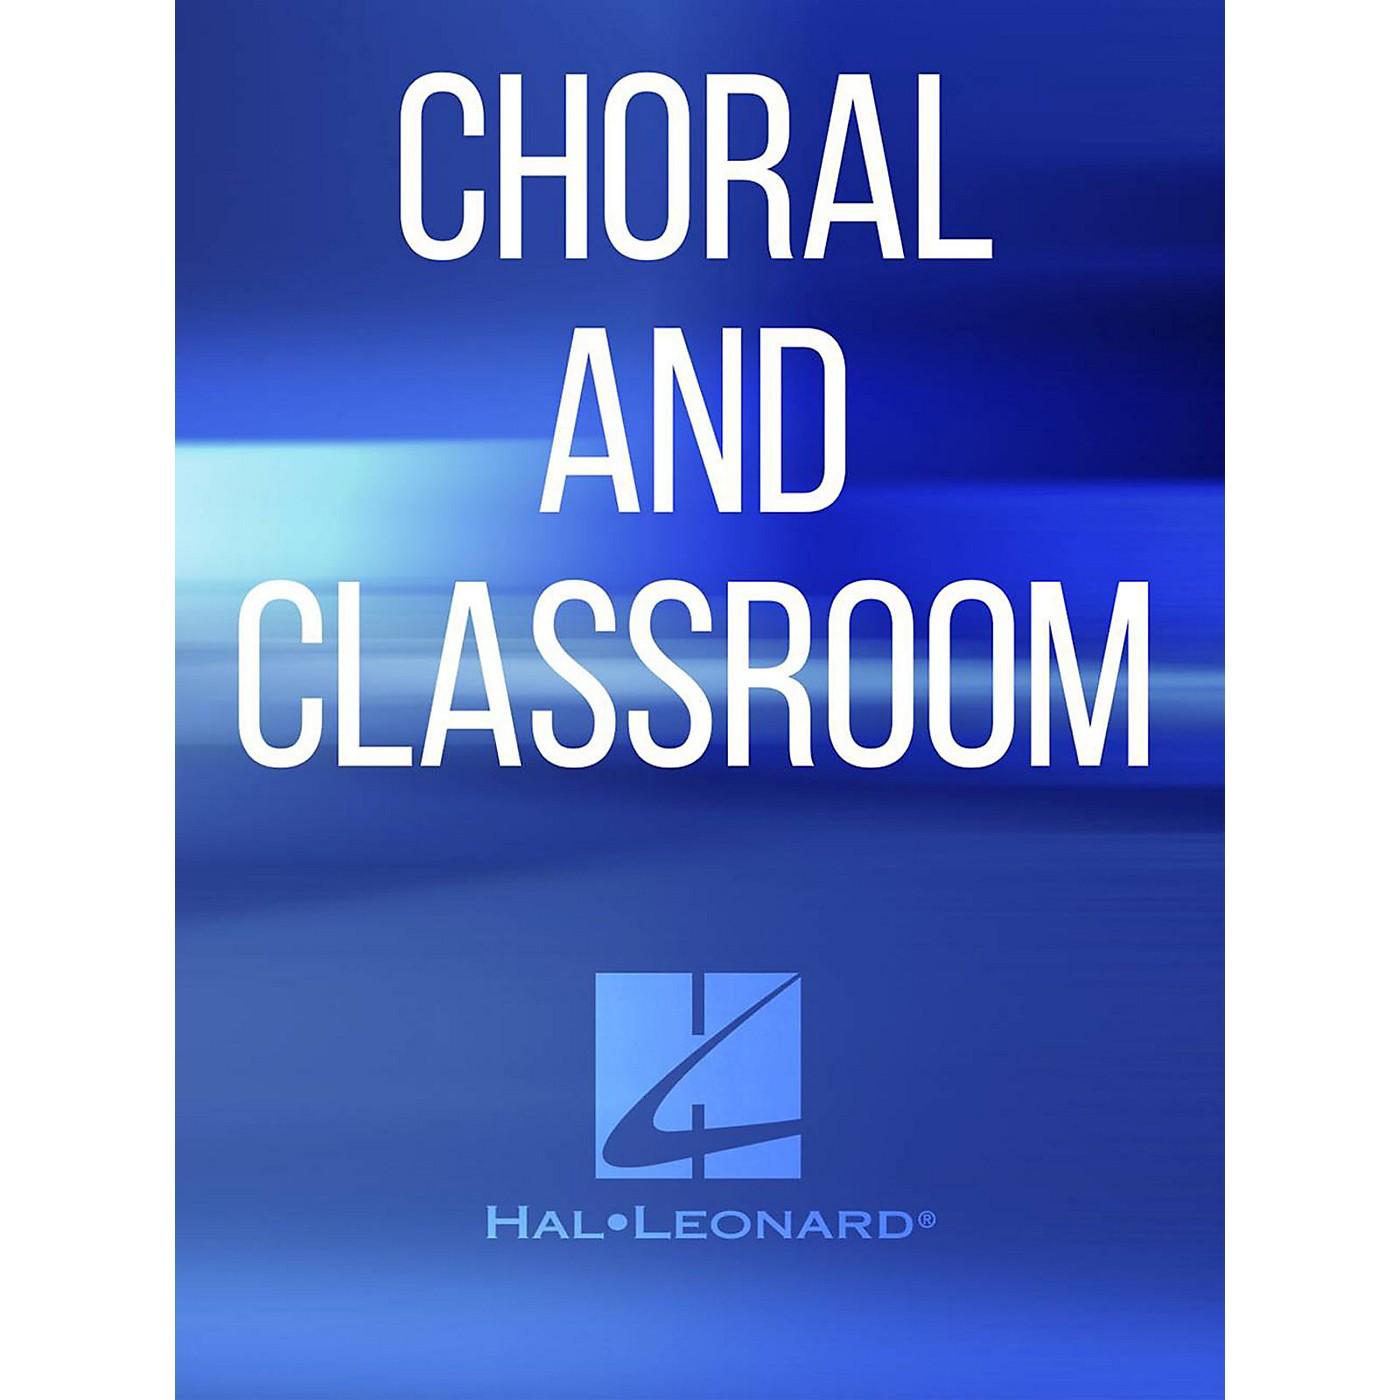 Hal Leonard Christmas Carols - Set 1 SATB Composed by Dale Grotenhuis thumbnail